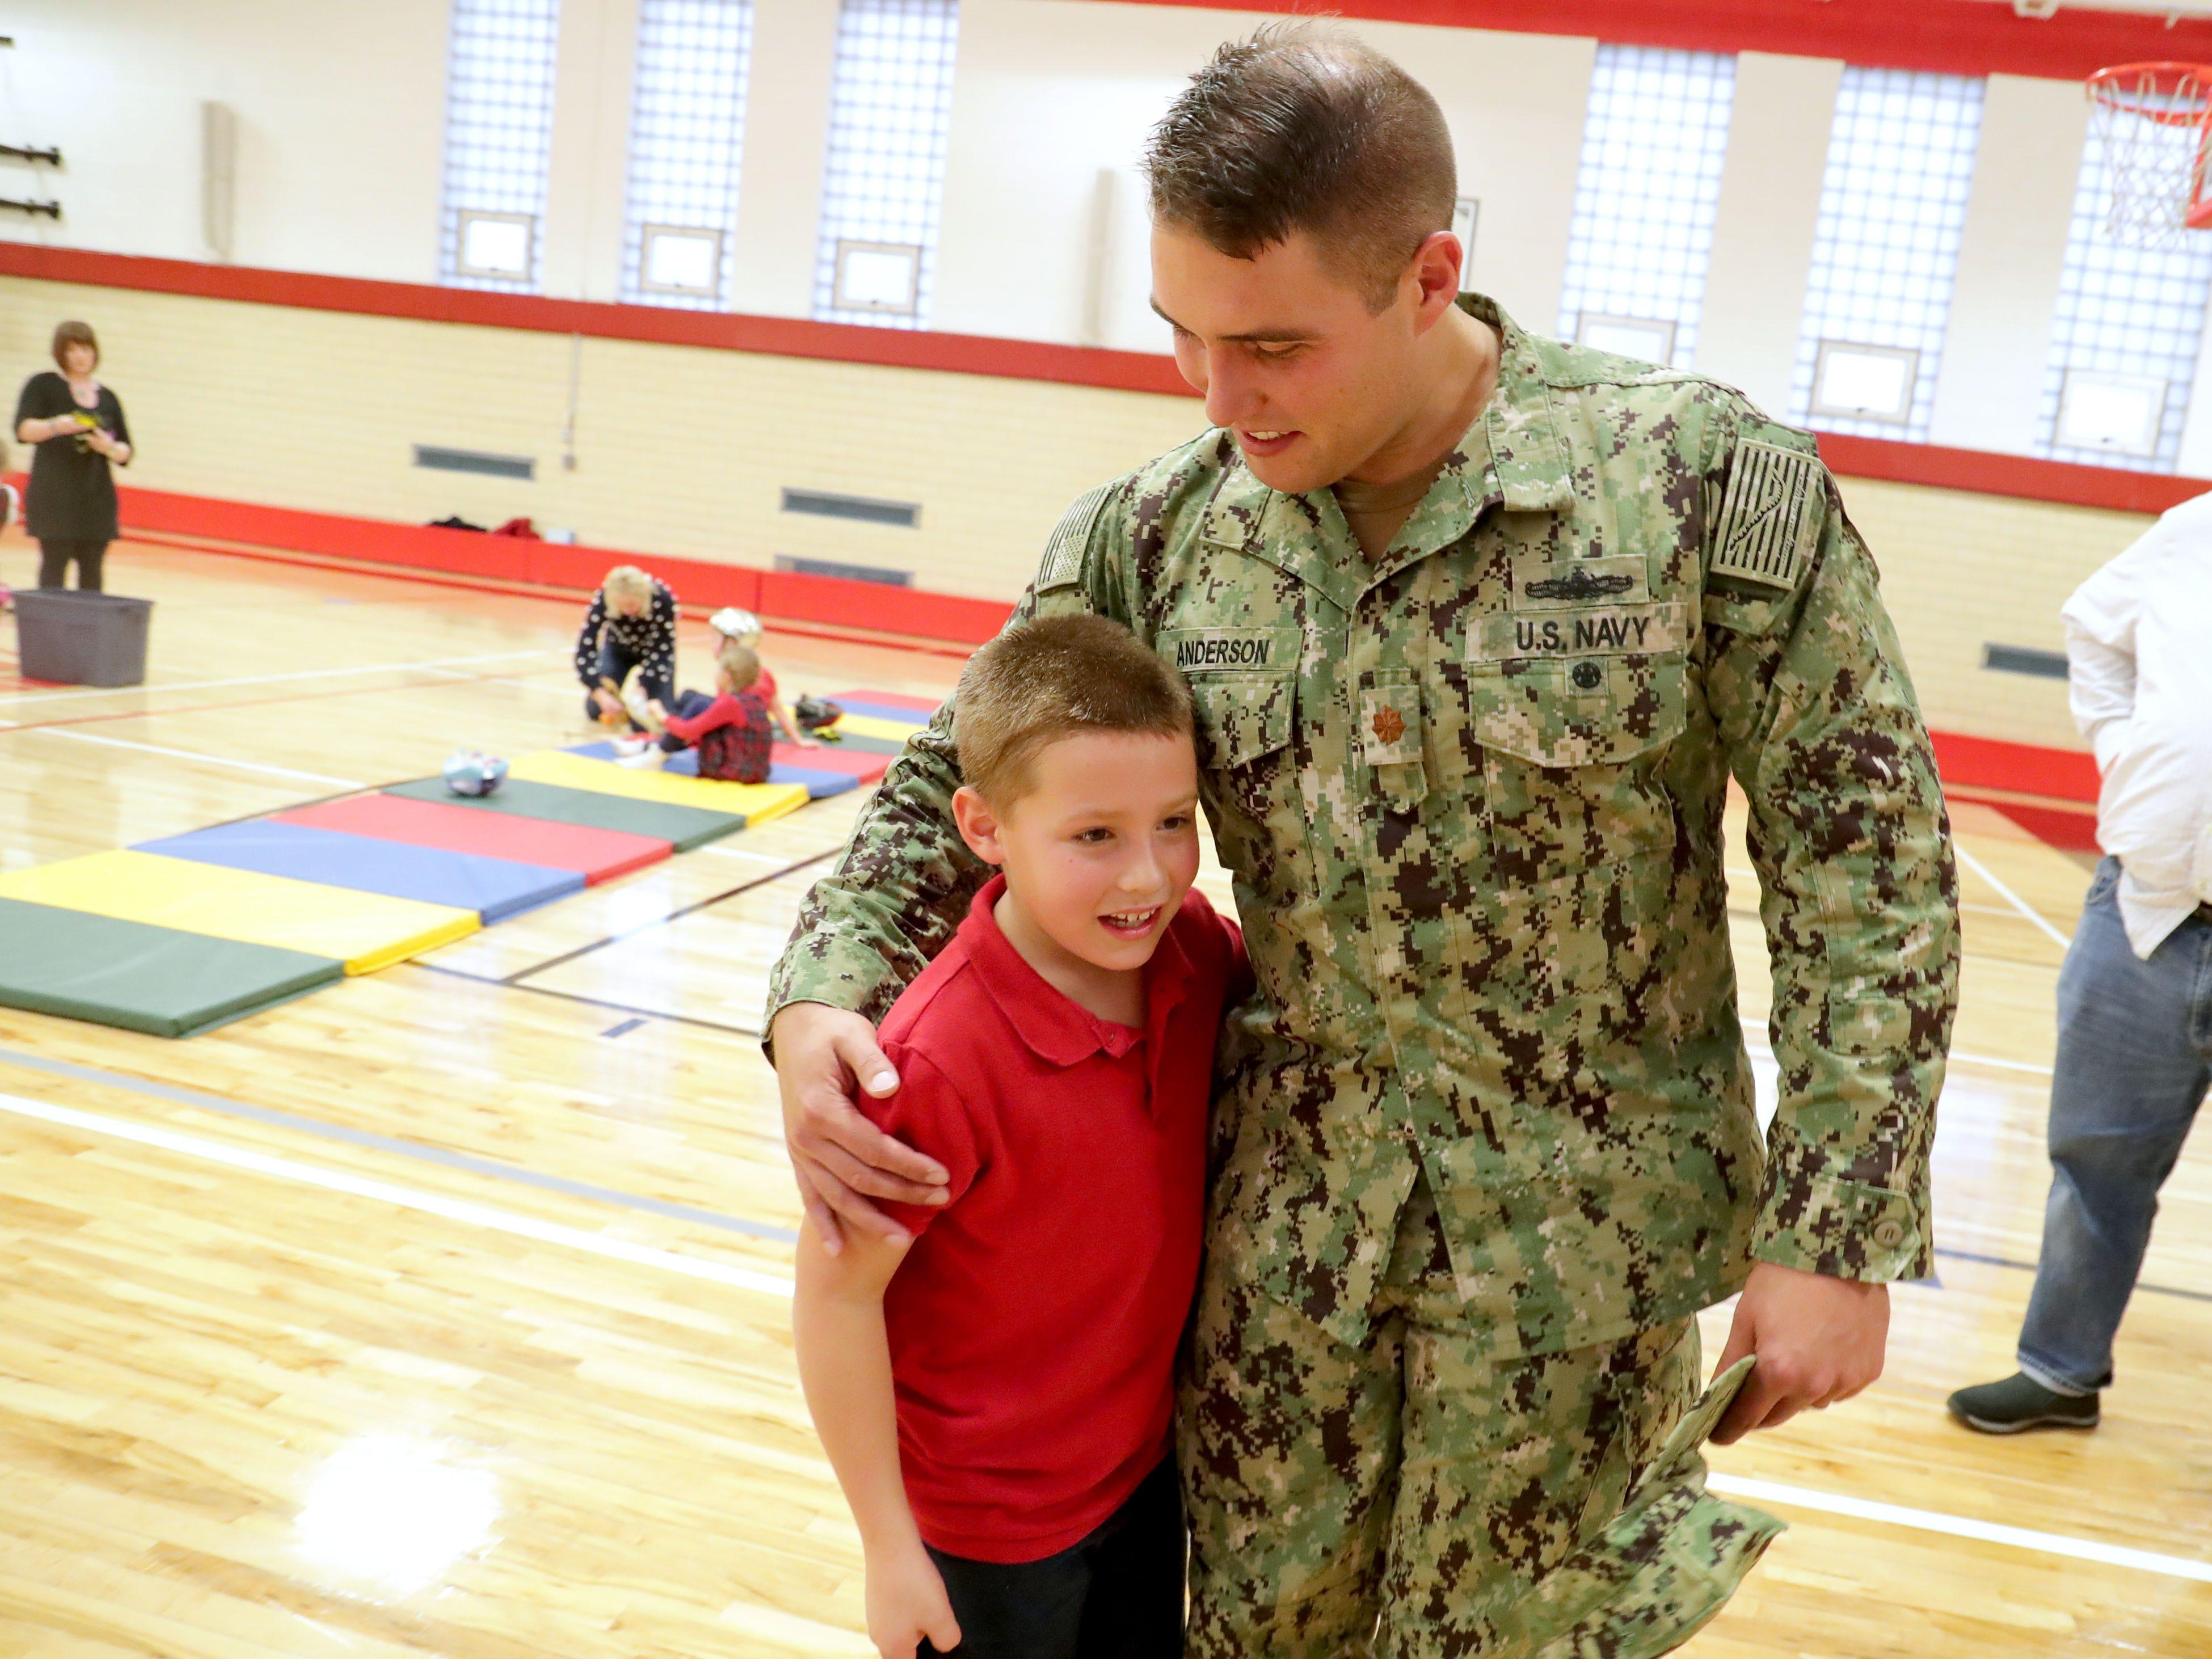 Ethan Anderson hugs his father, Navy Lt. Cmdr. Jon-Andrew Anderson-Ingebrigtsen.